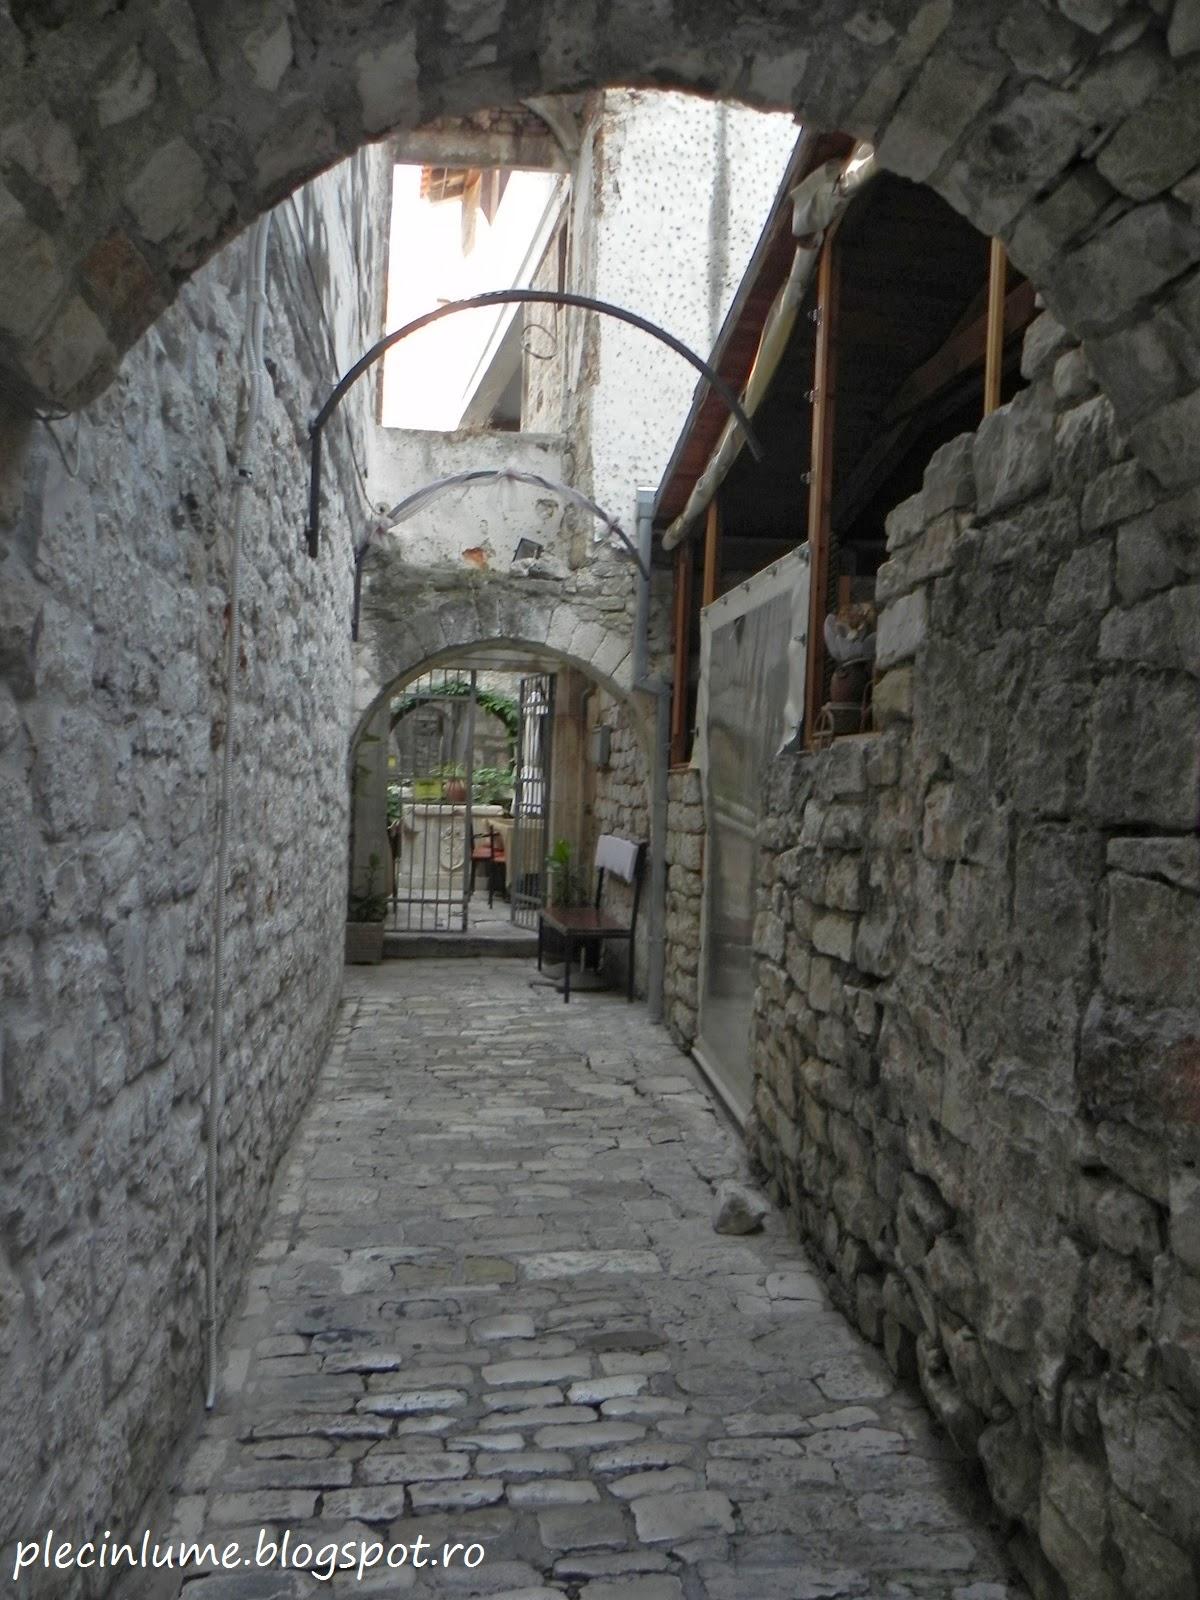 Straduta din Trogir, Croatia